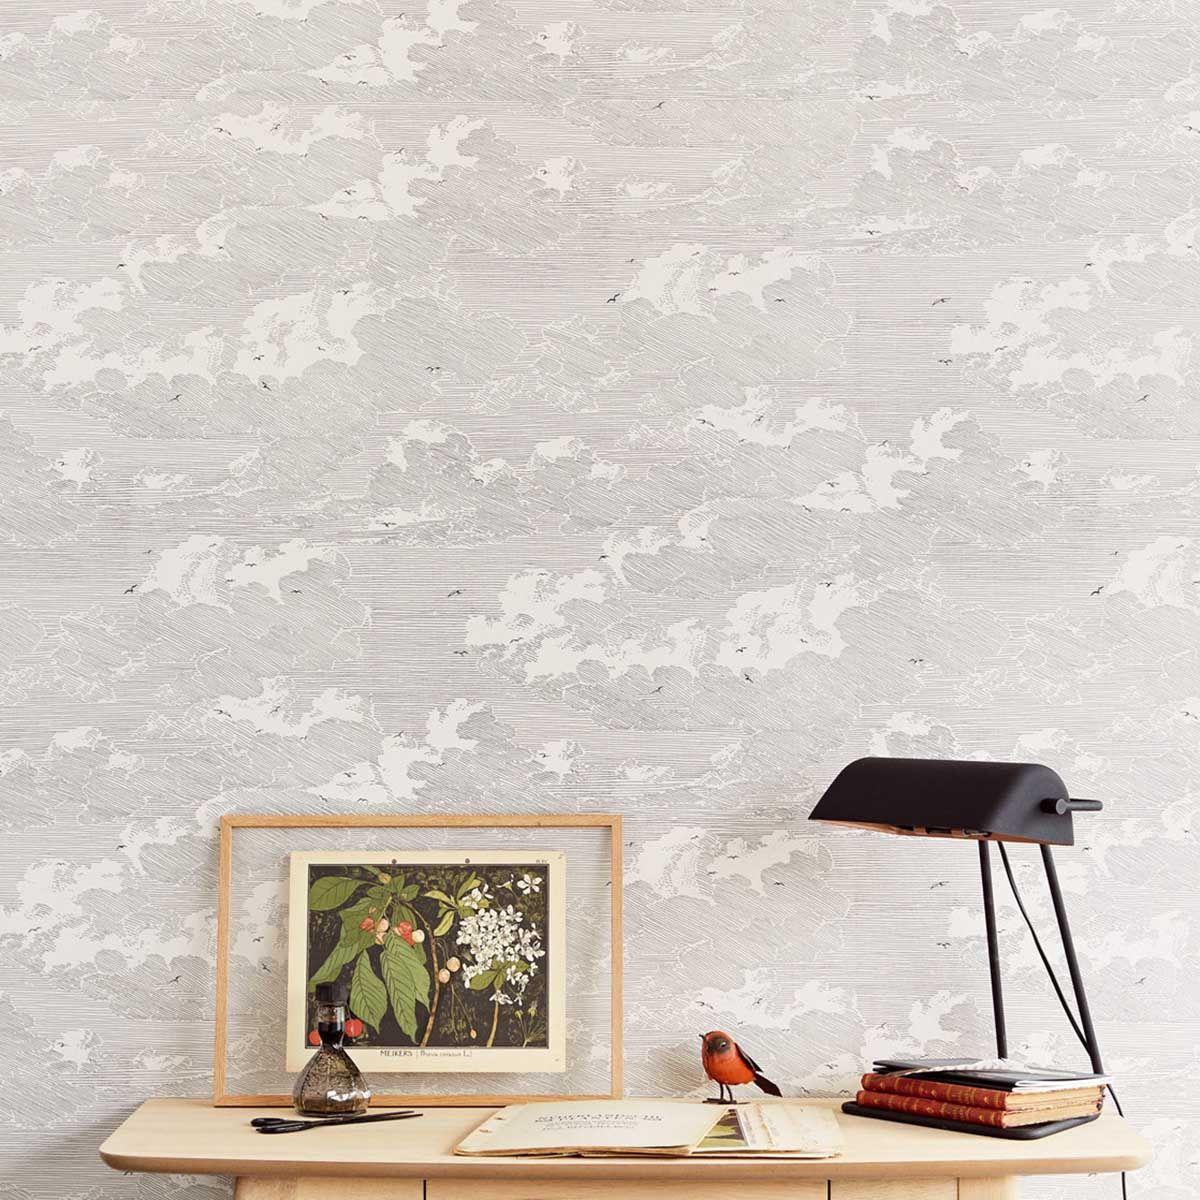 Papier peint Feathery Clouds - Eijffinger in 2019 | Cloud wallpaper, Wallpaper, Clouds